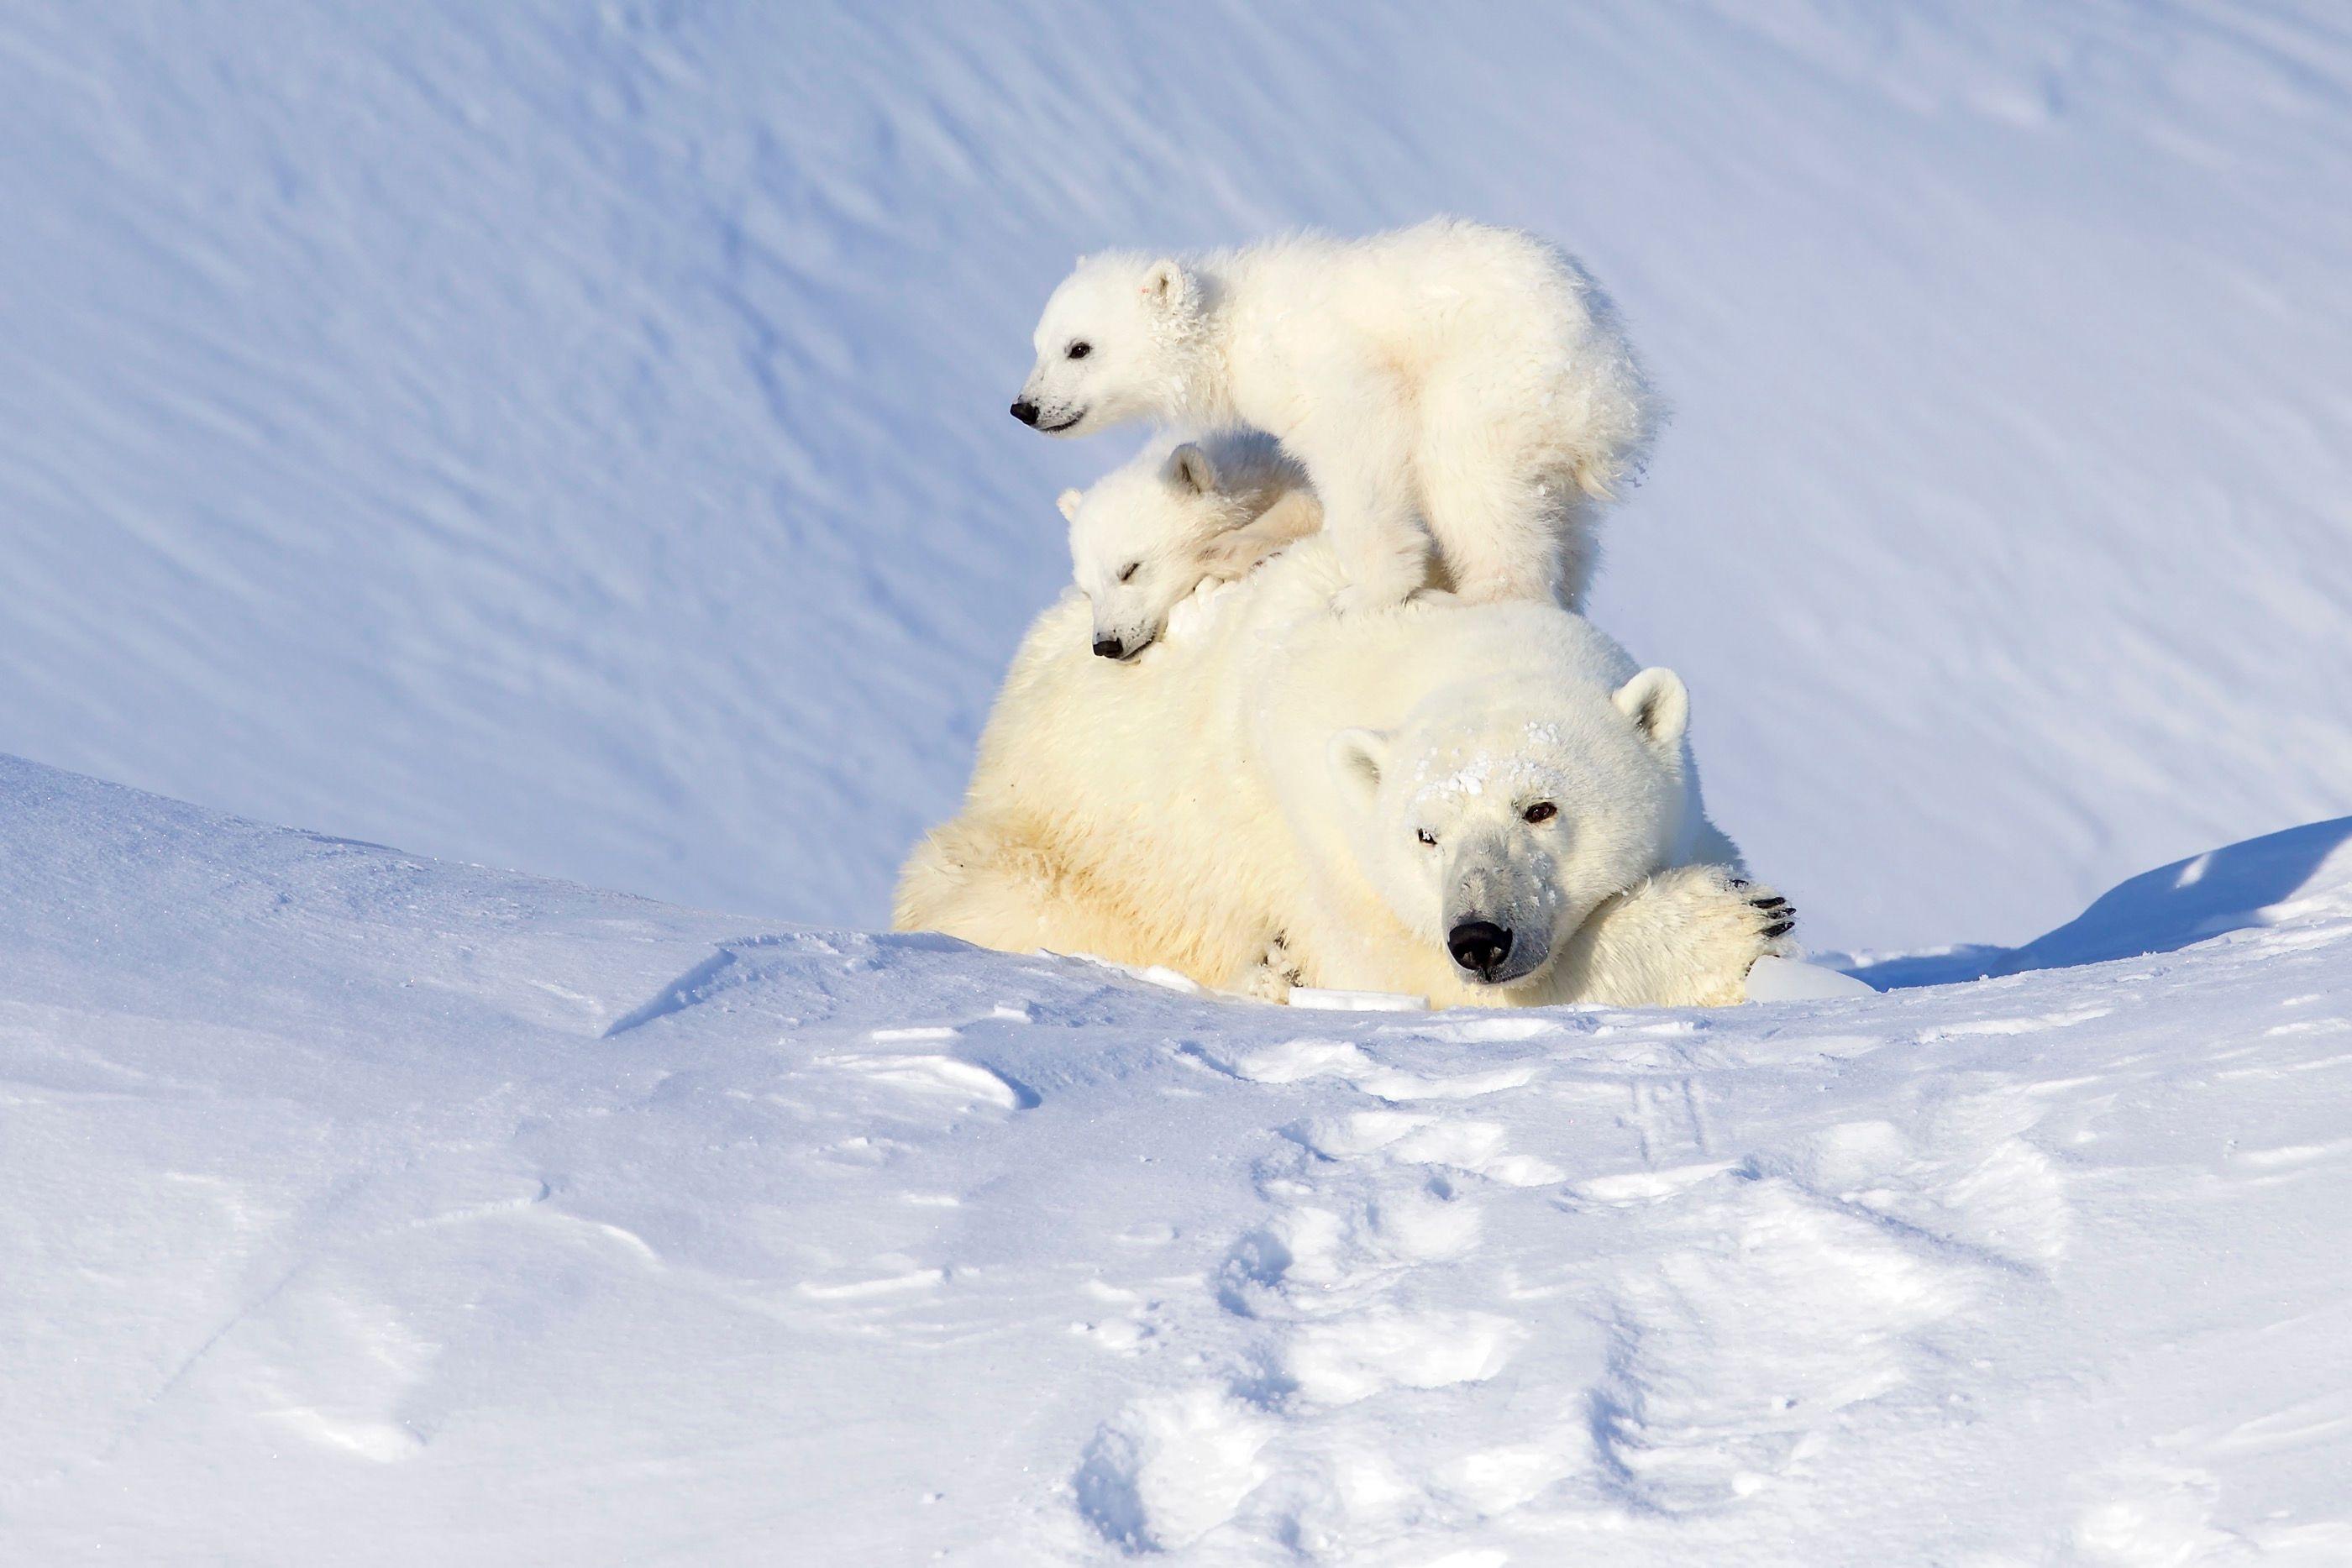 Baffin Island (Andy Skillen)